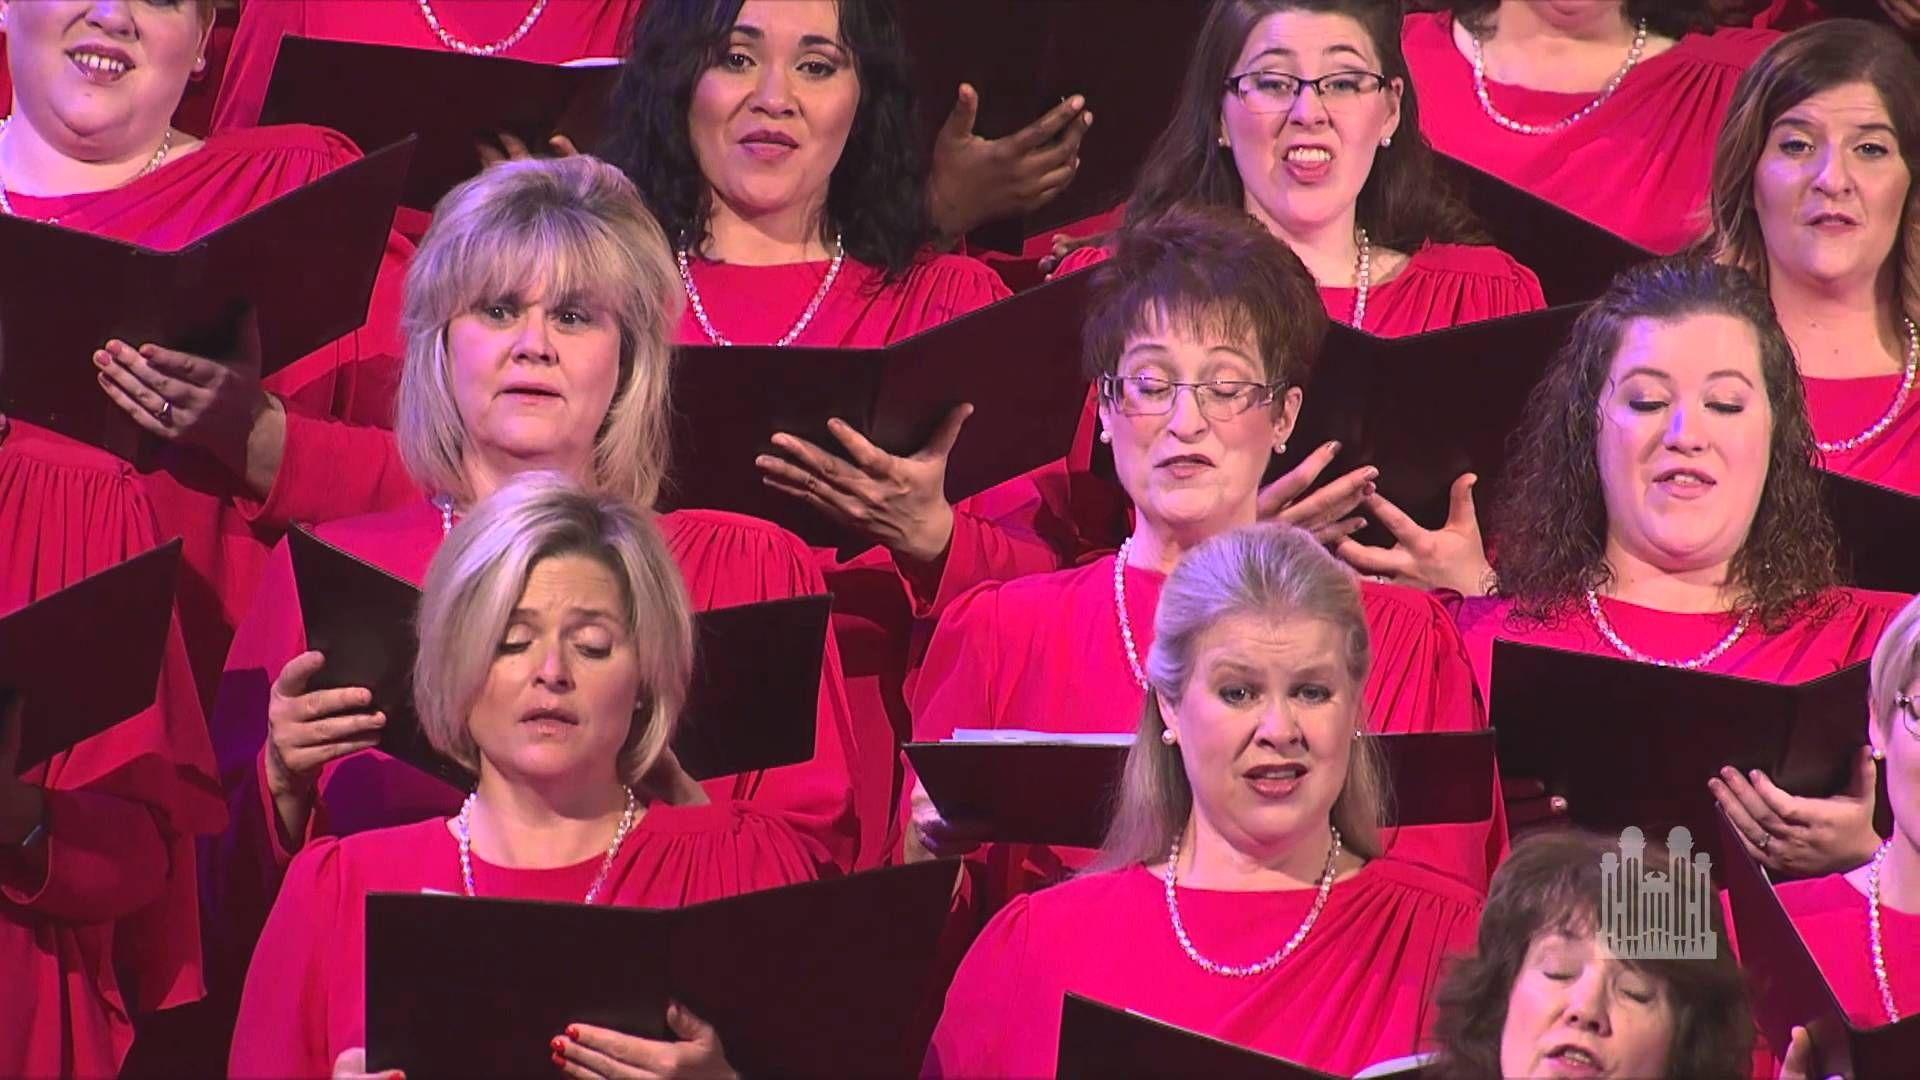 Lovely Appear - Mormon Tabernacle Choir | Mormon Tabernacle Choir ...